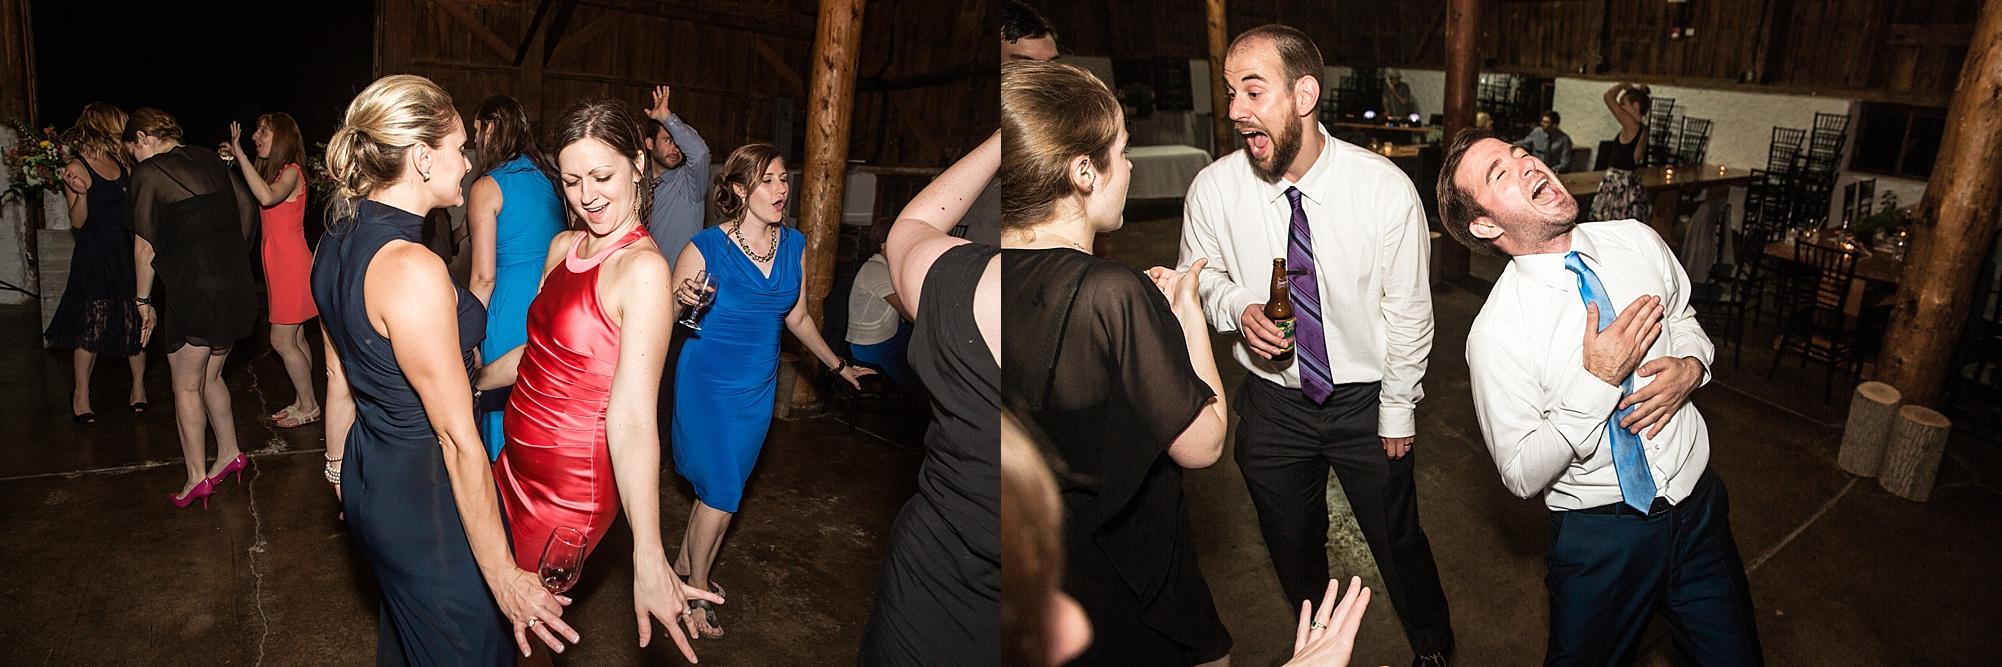 ballsfalls-wedding-photography_0115.jpg